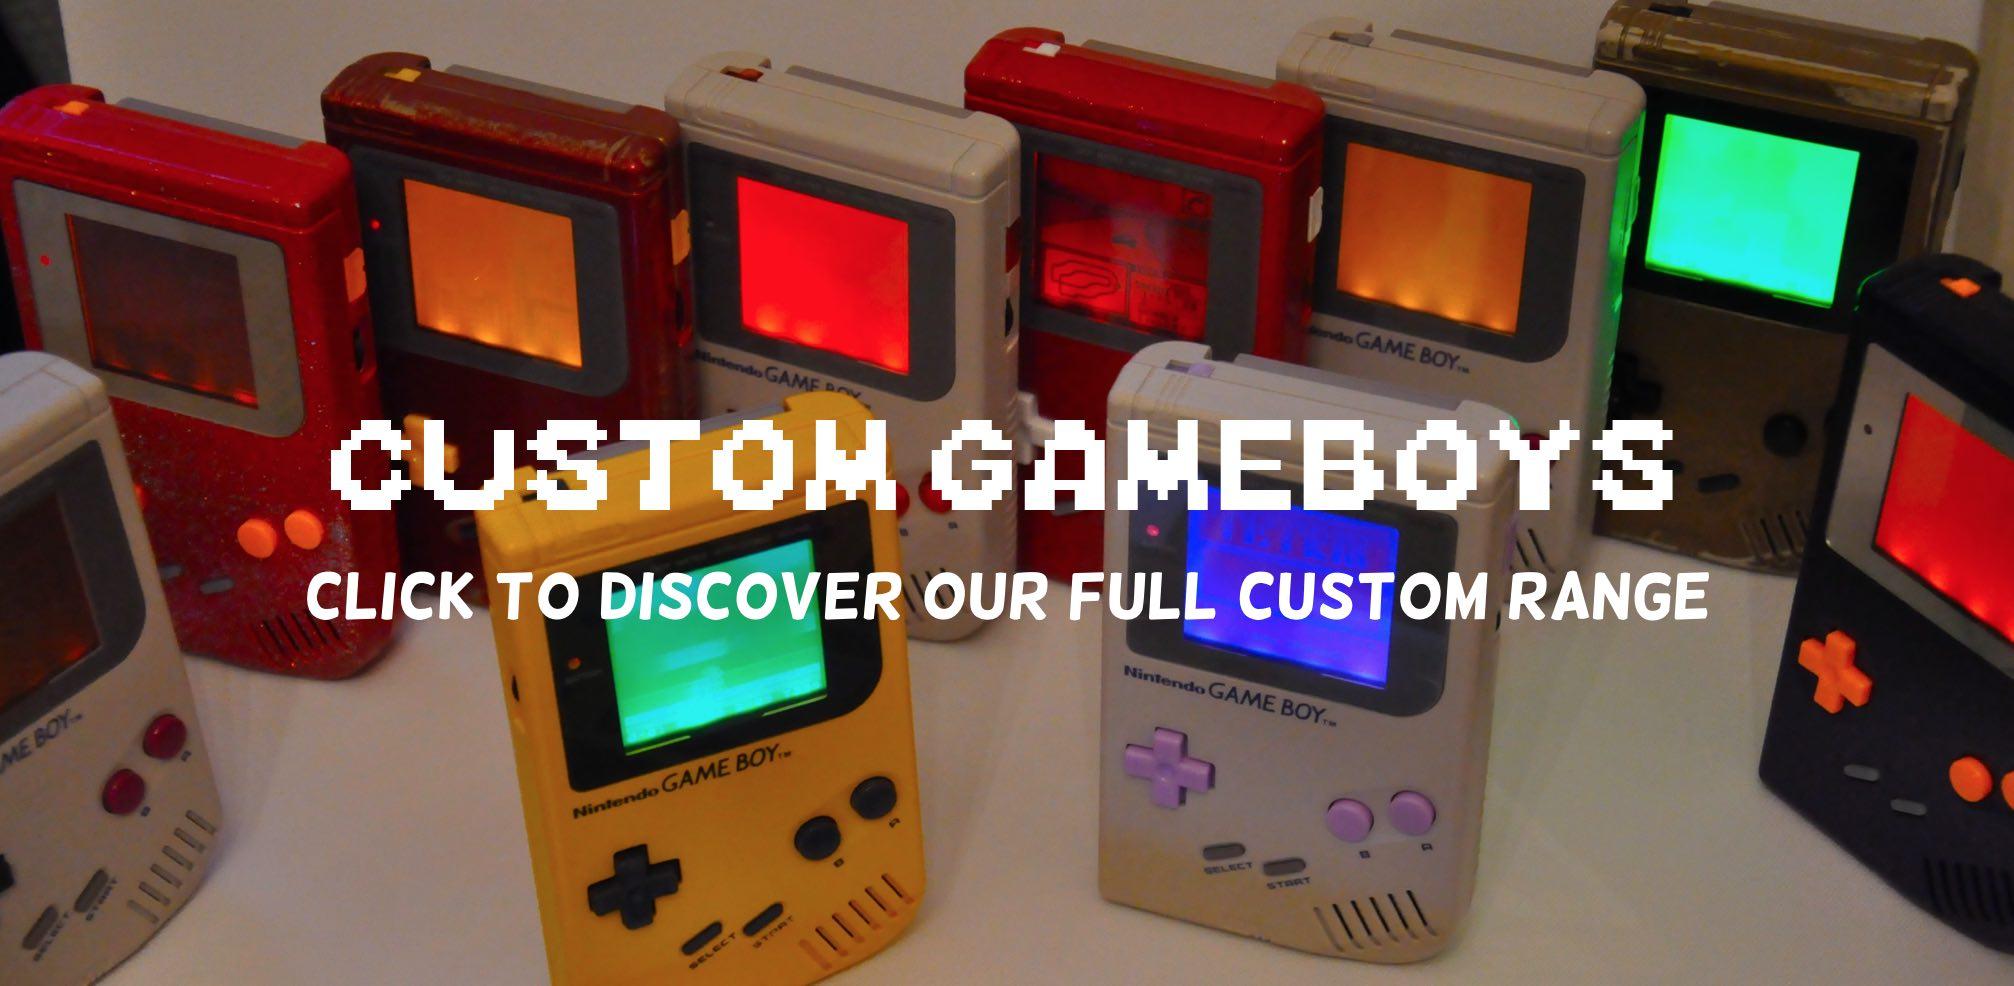 gameboy-promo